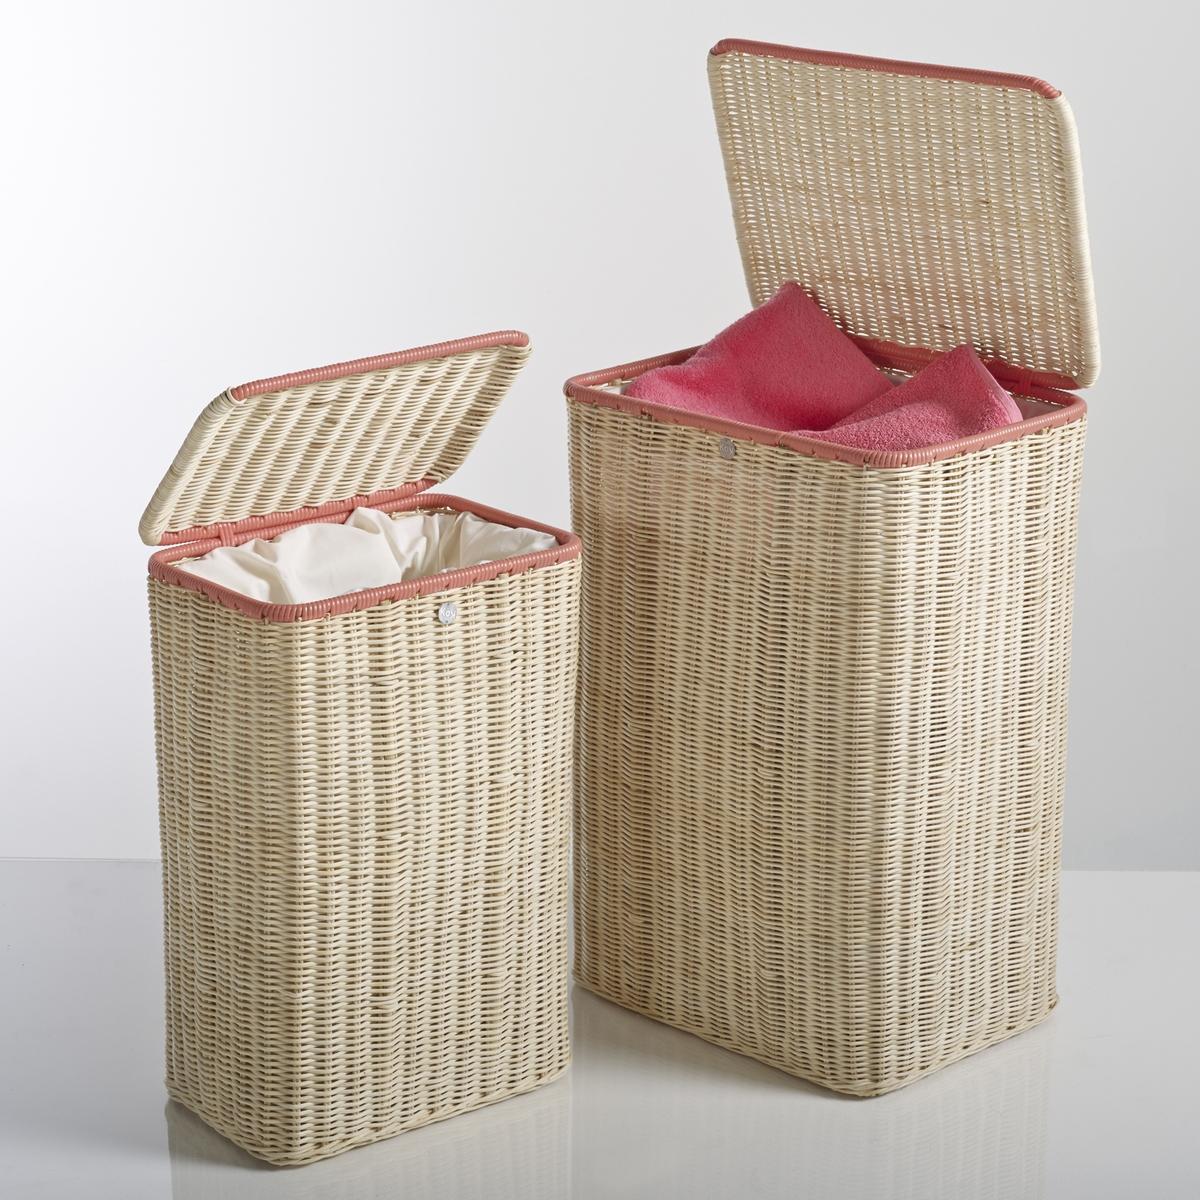 Комплект из 2 корзин с плетеной крышкой KOK, Ozier